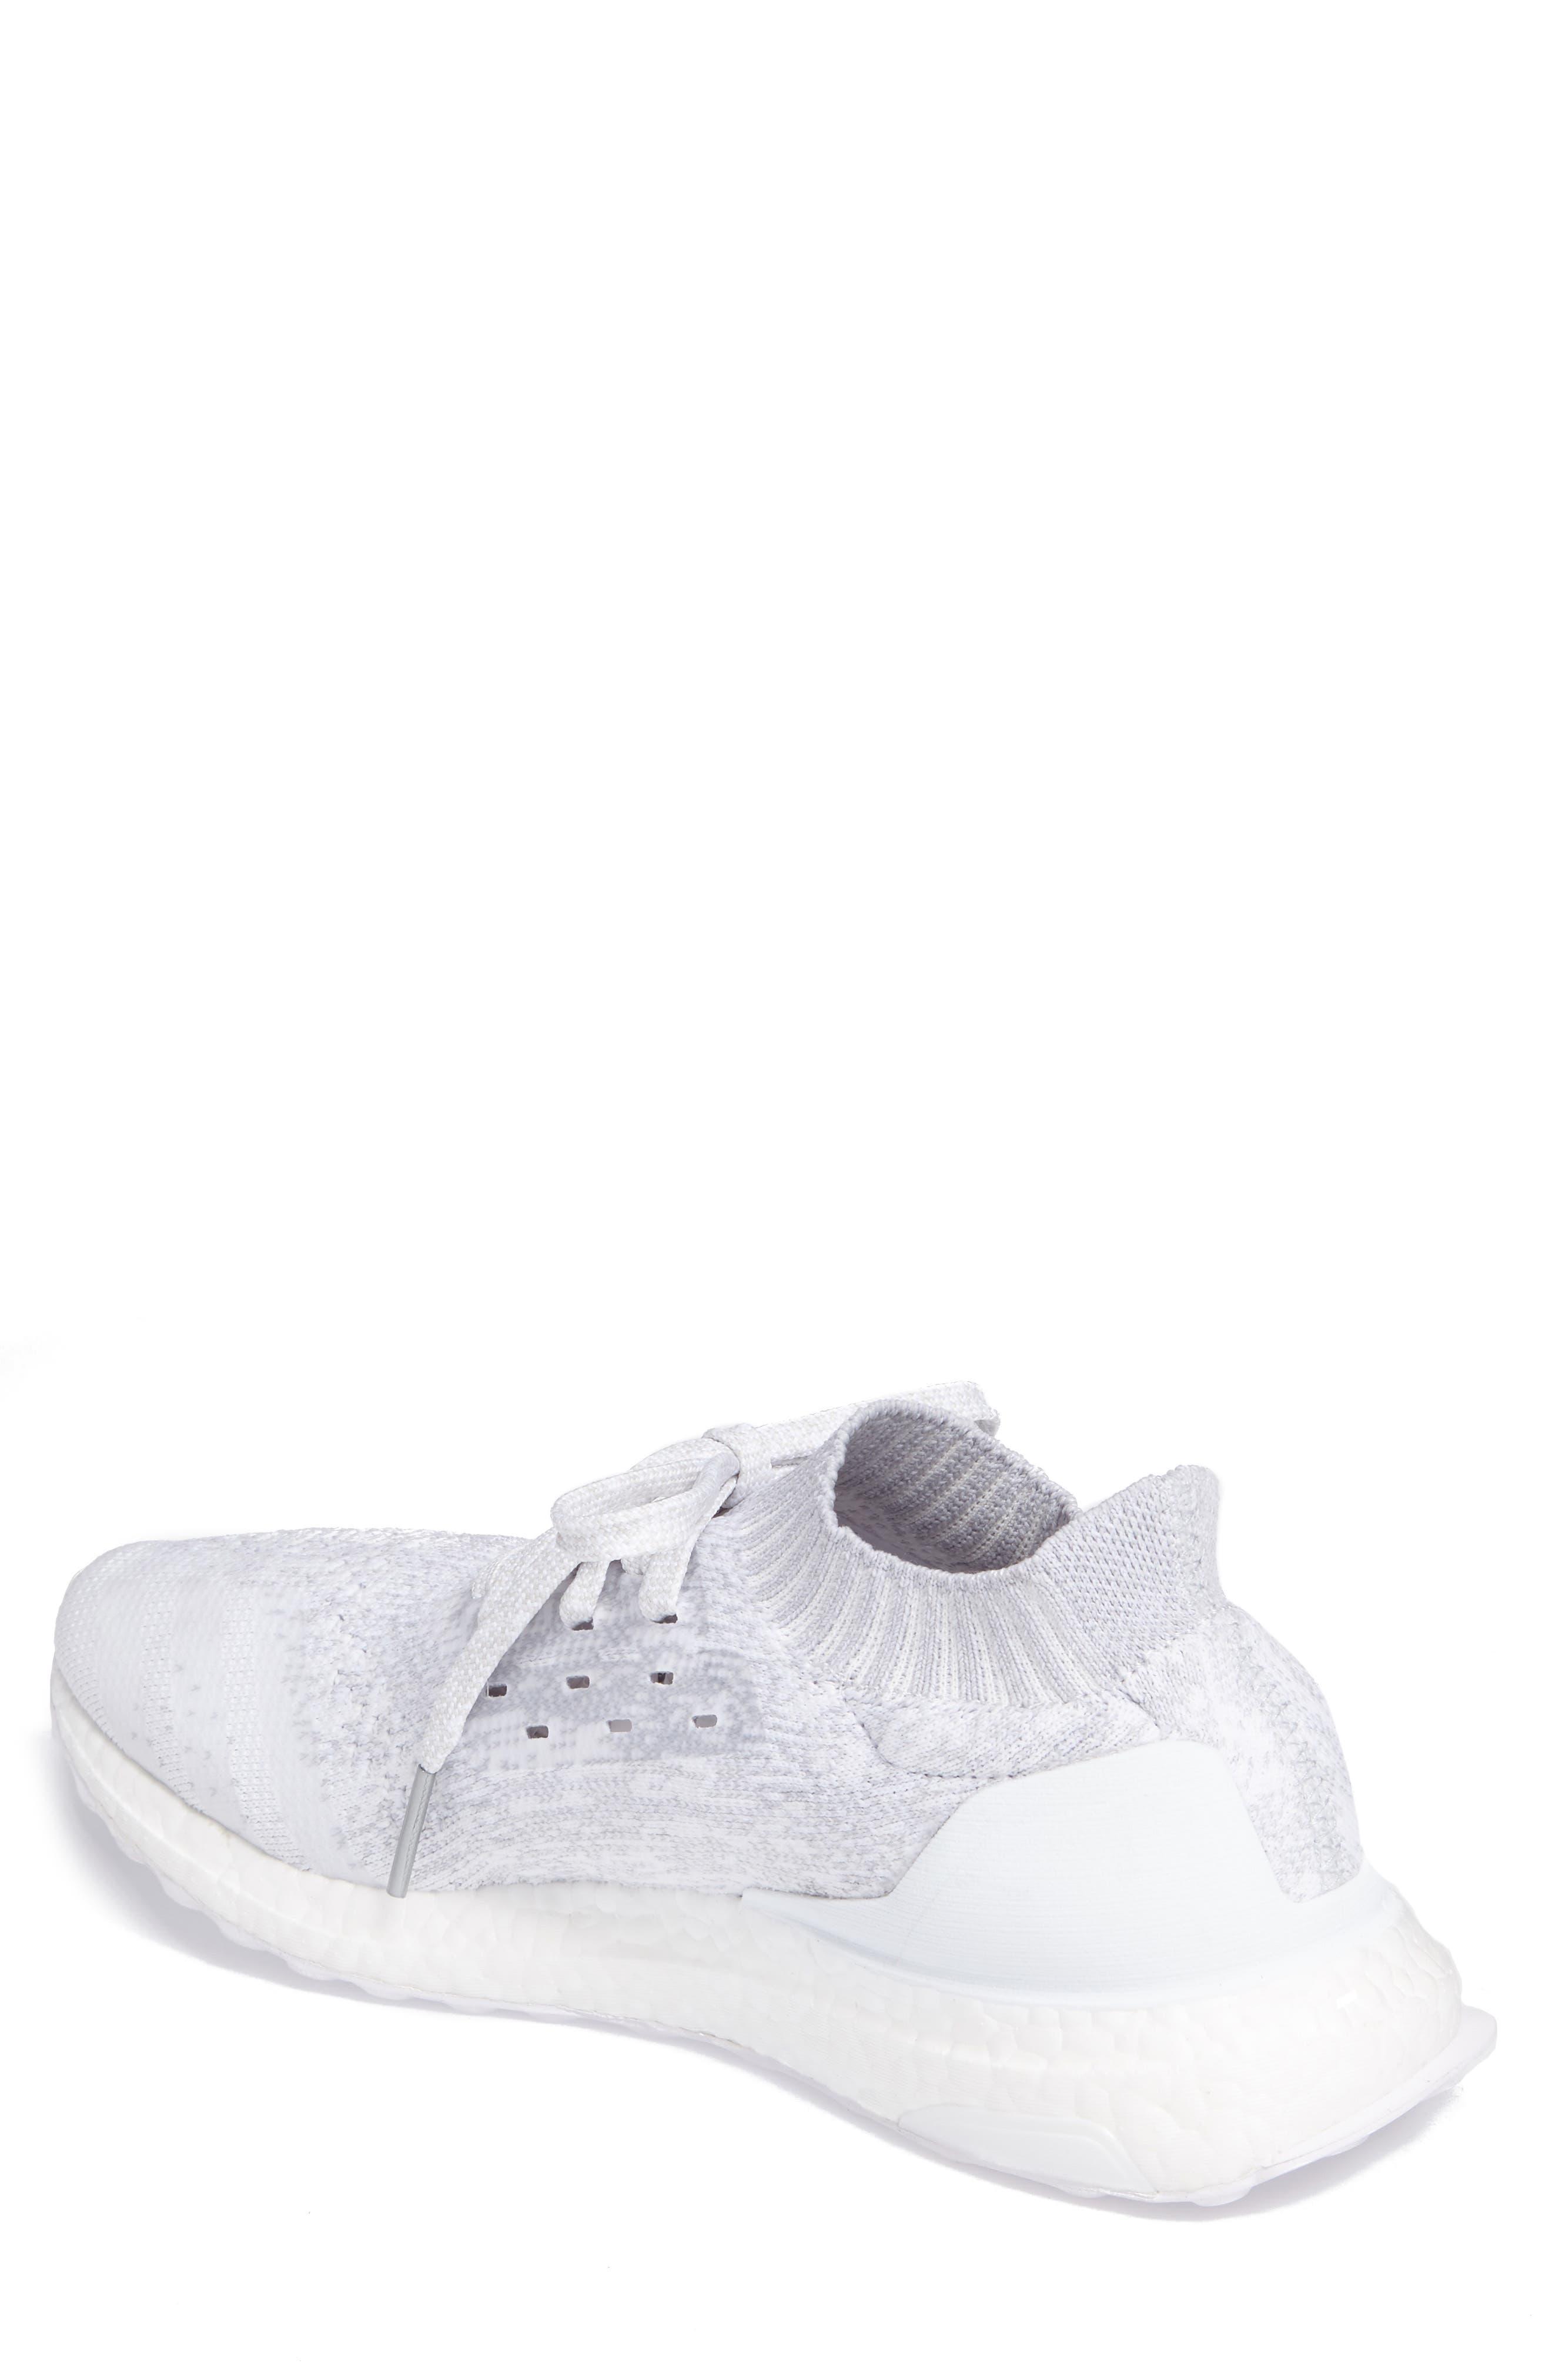 Alternate Image 2  - adidas 'UltraBOOST Uncaged' Running Shoe (Men)